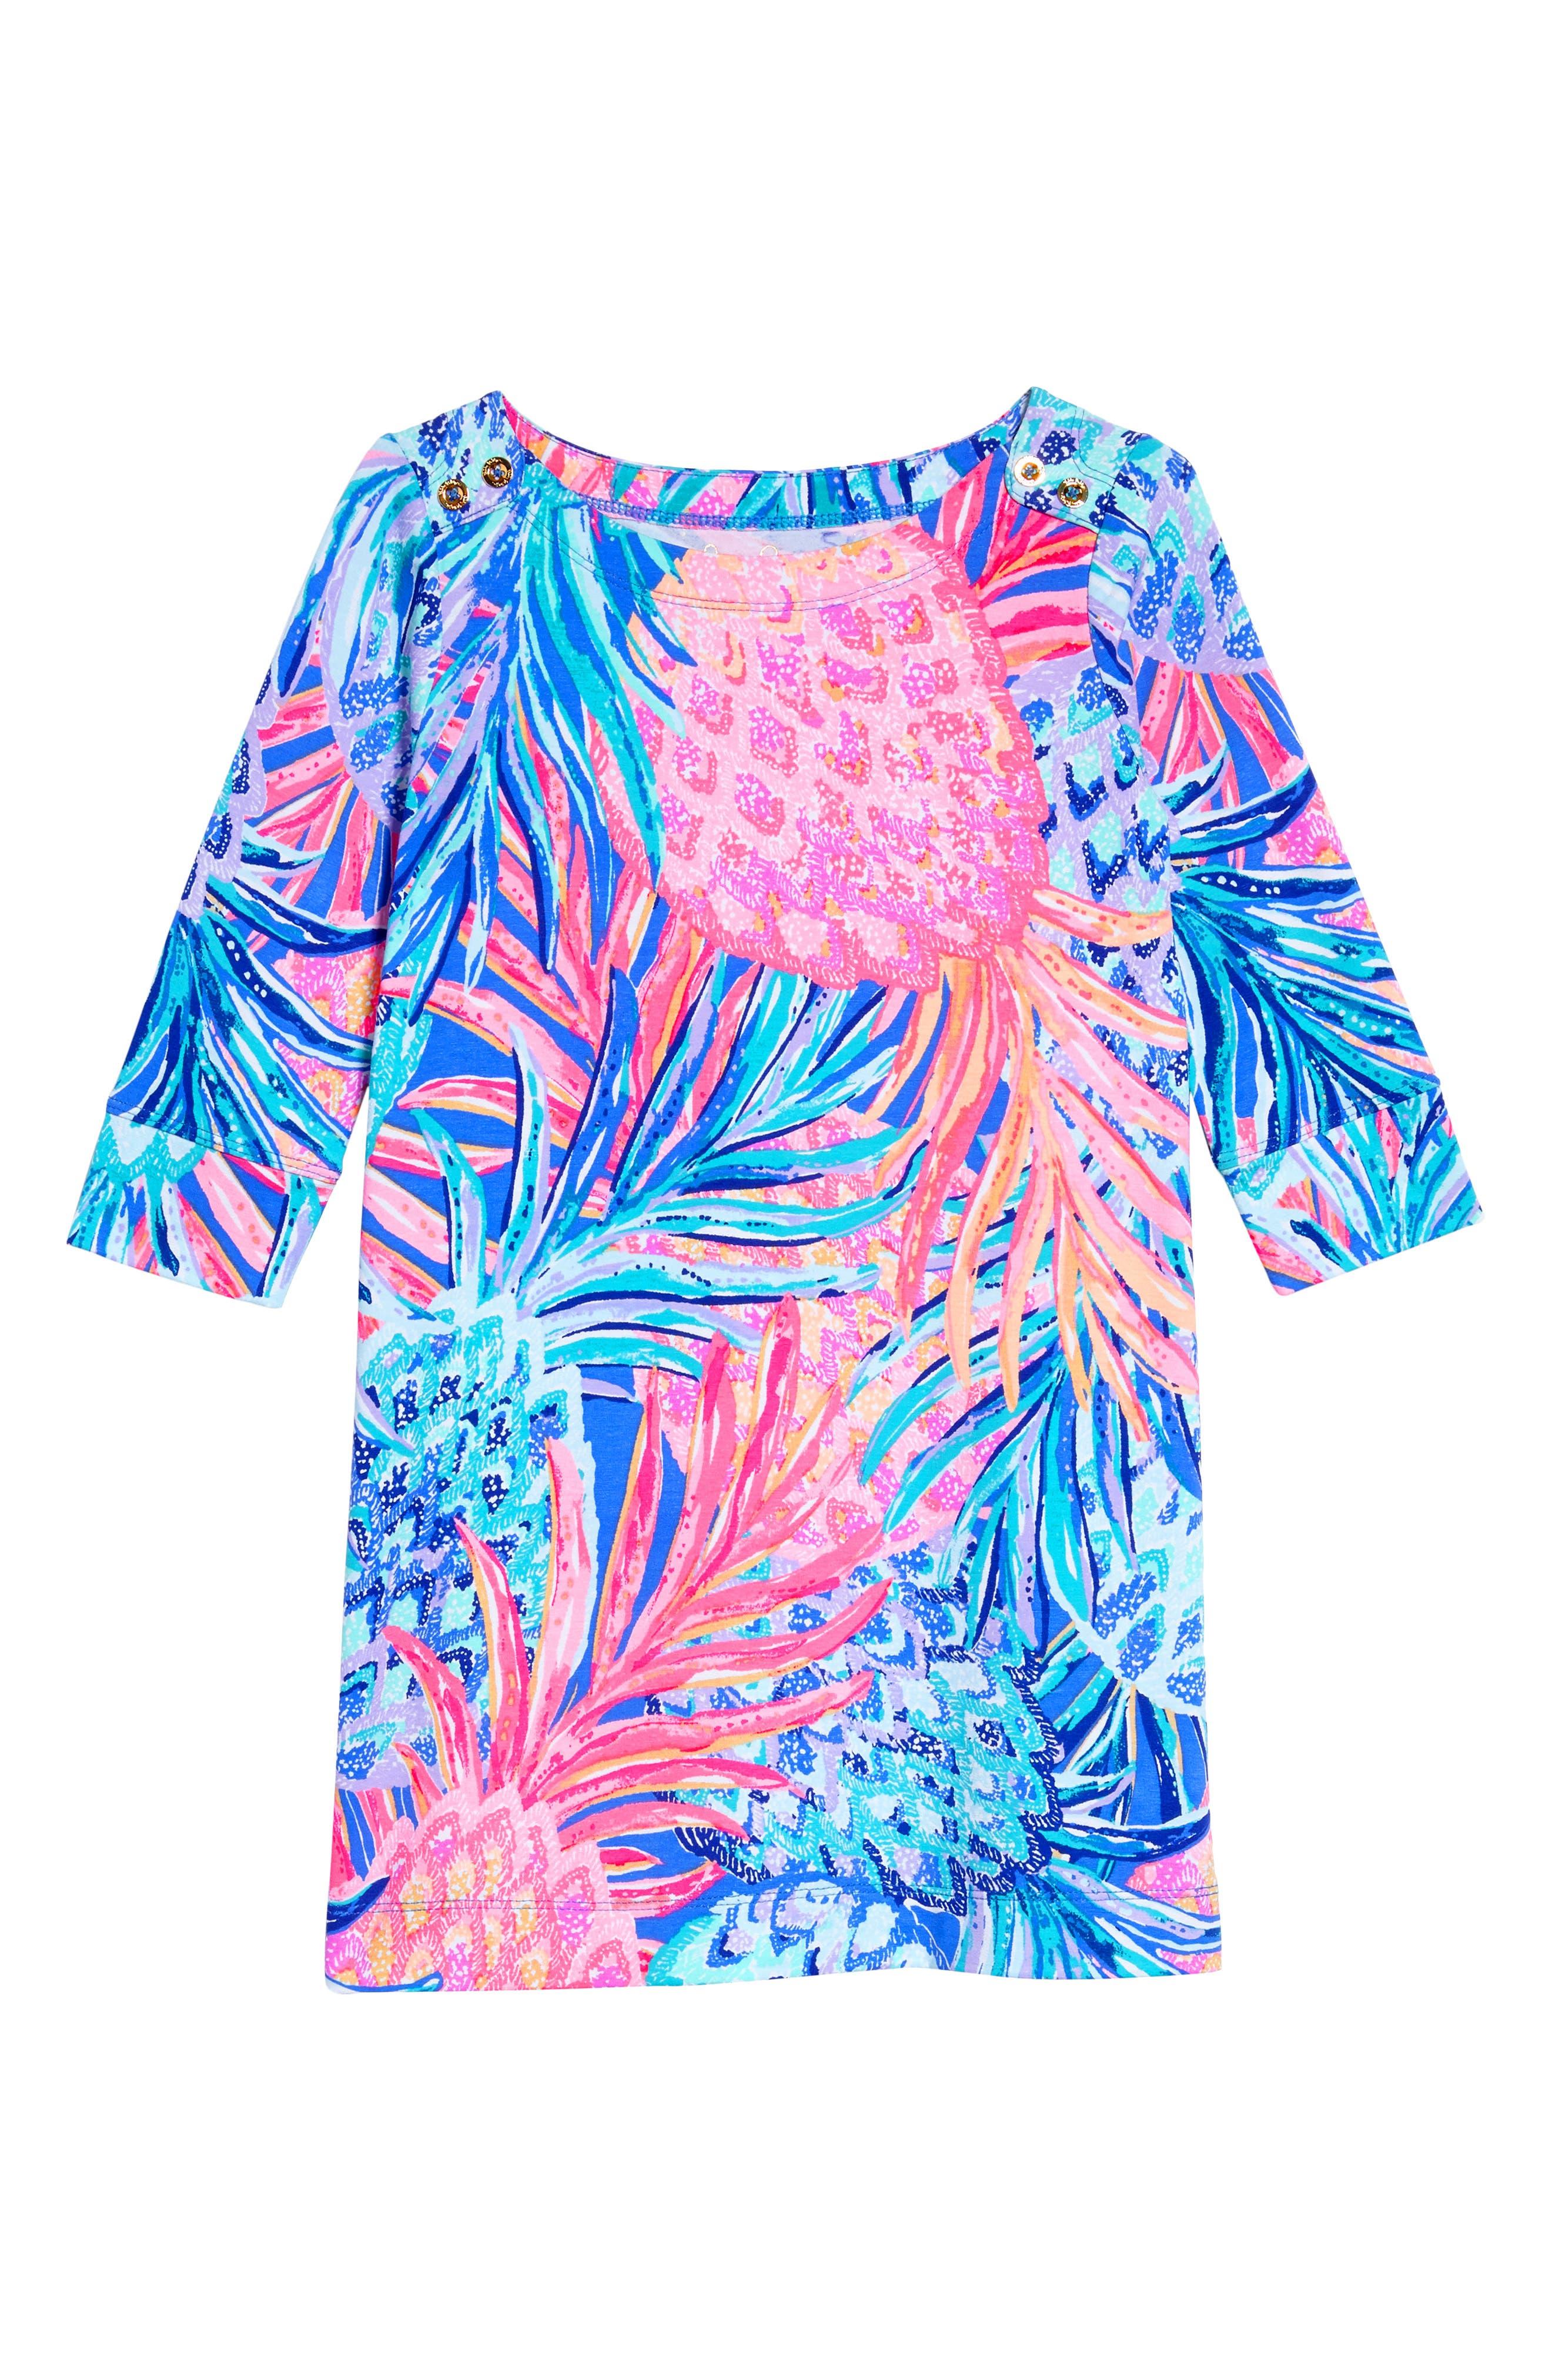 Mini Sophie UPF 50+ Dress,                         Main,                         color, 400